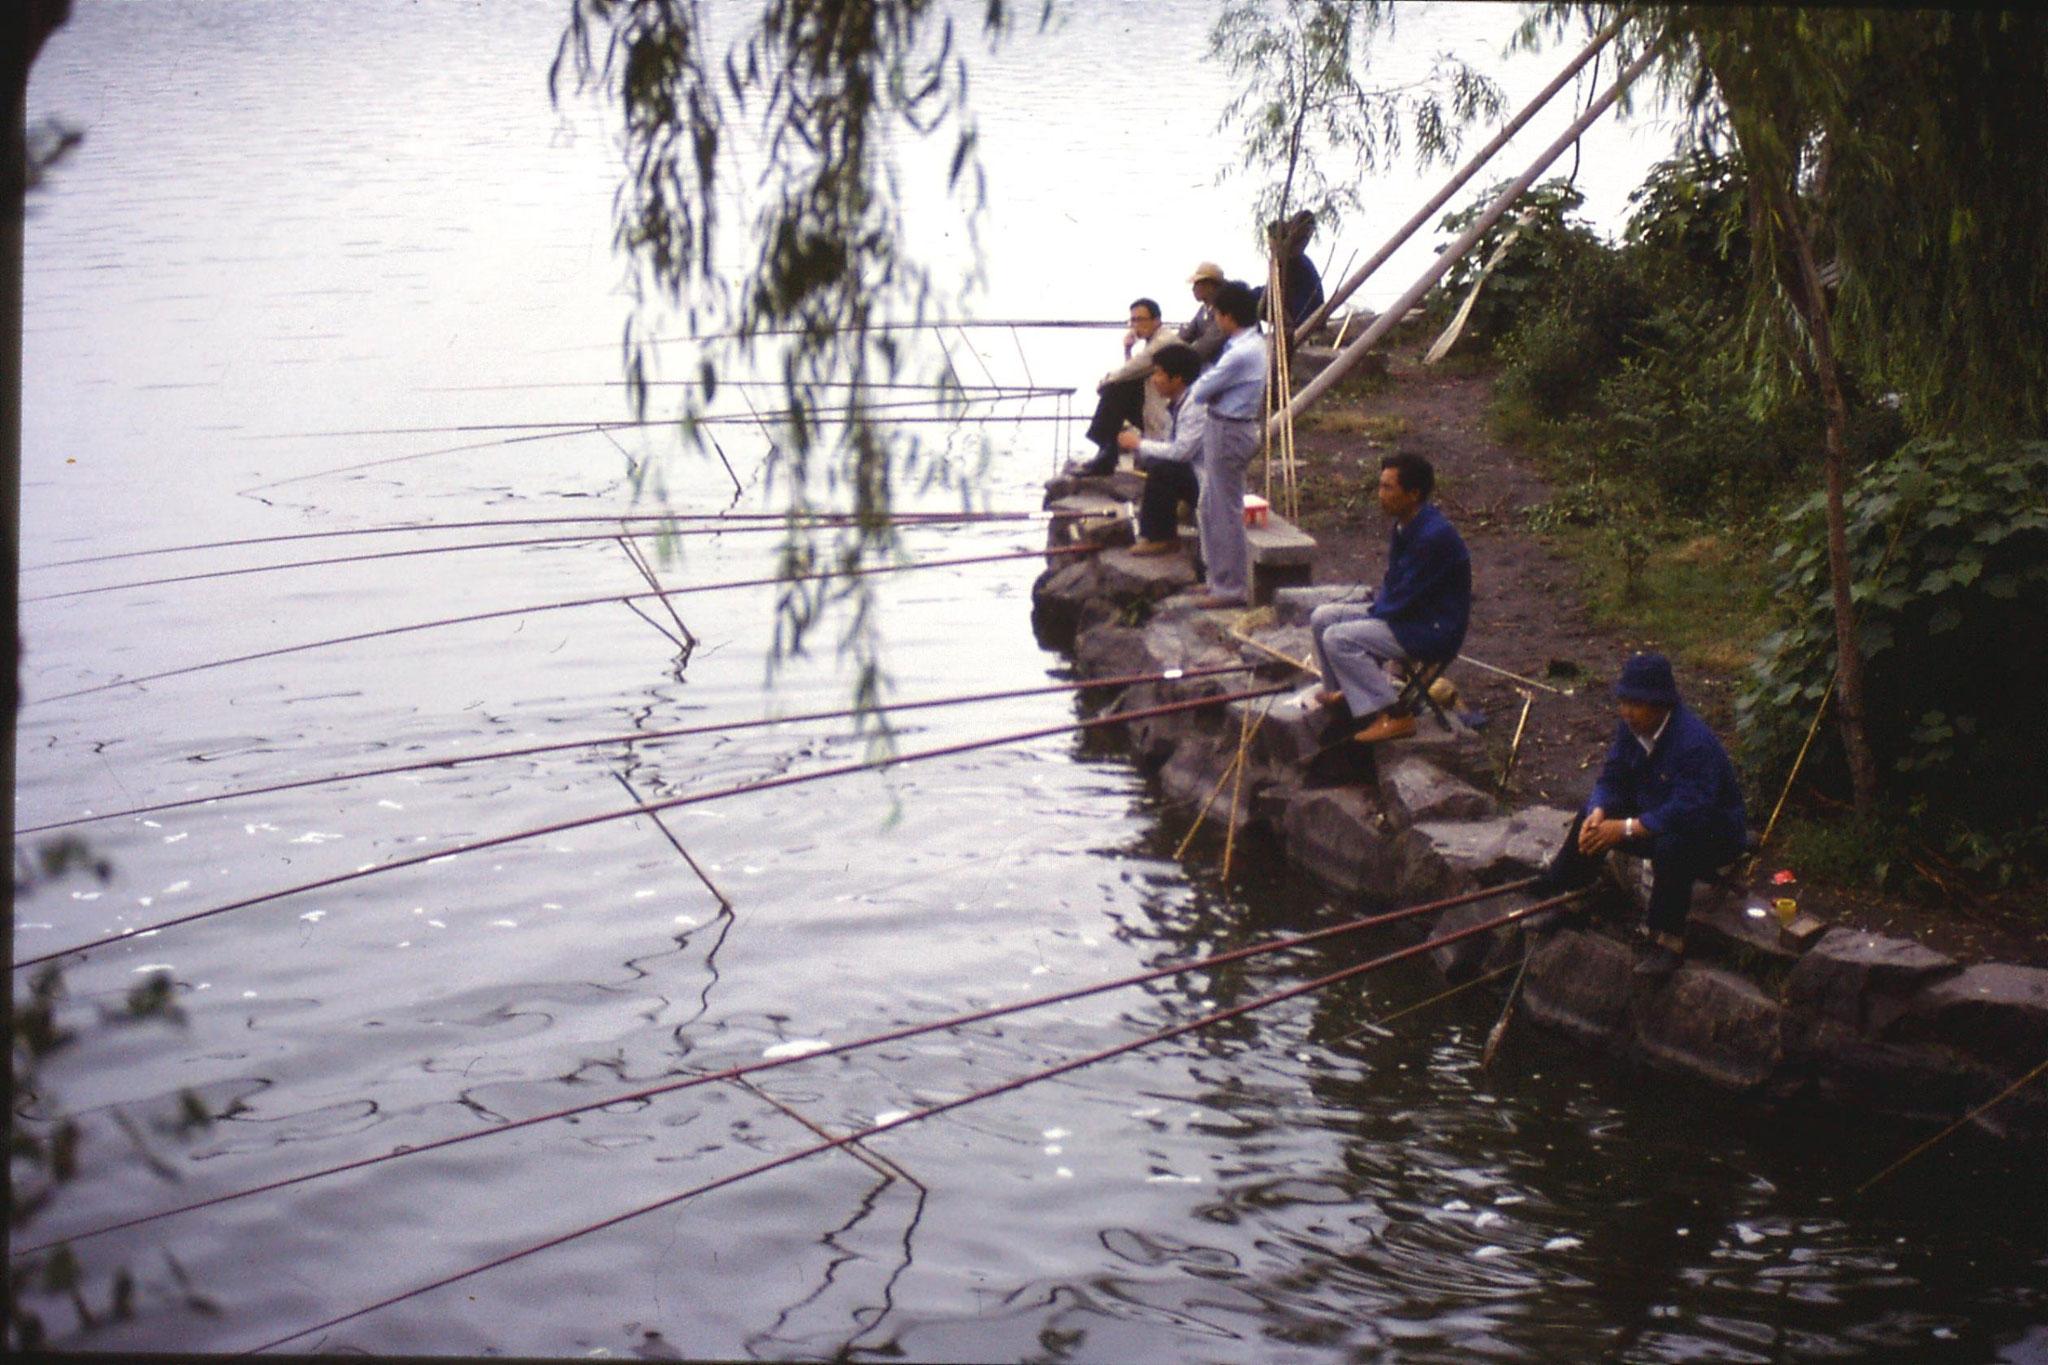 11/6/1989: 17: fishing off Su causeway